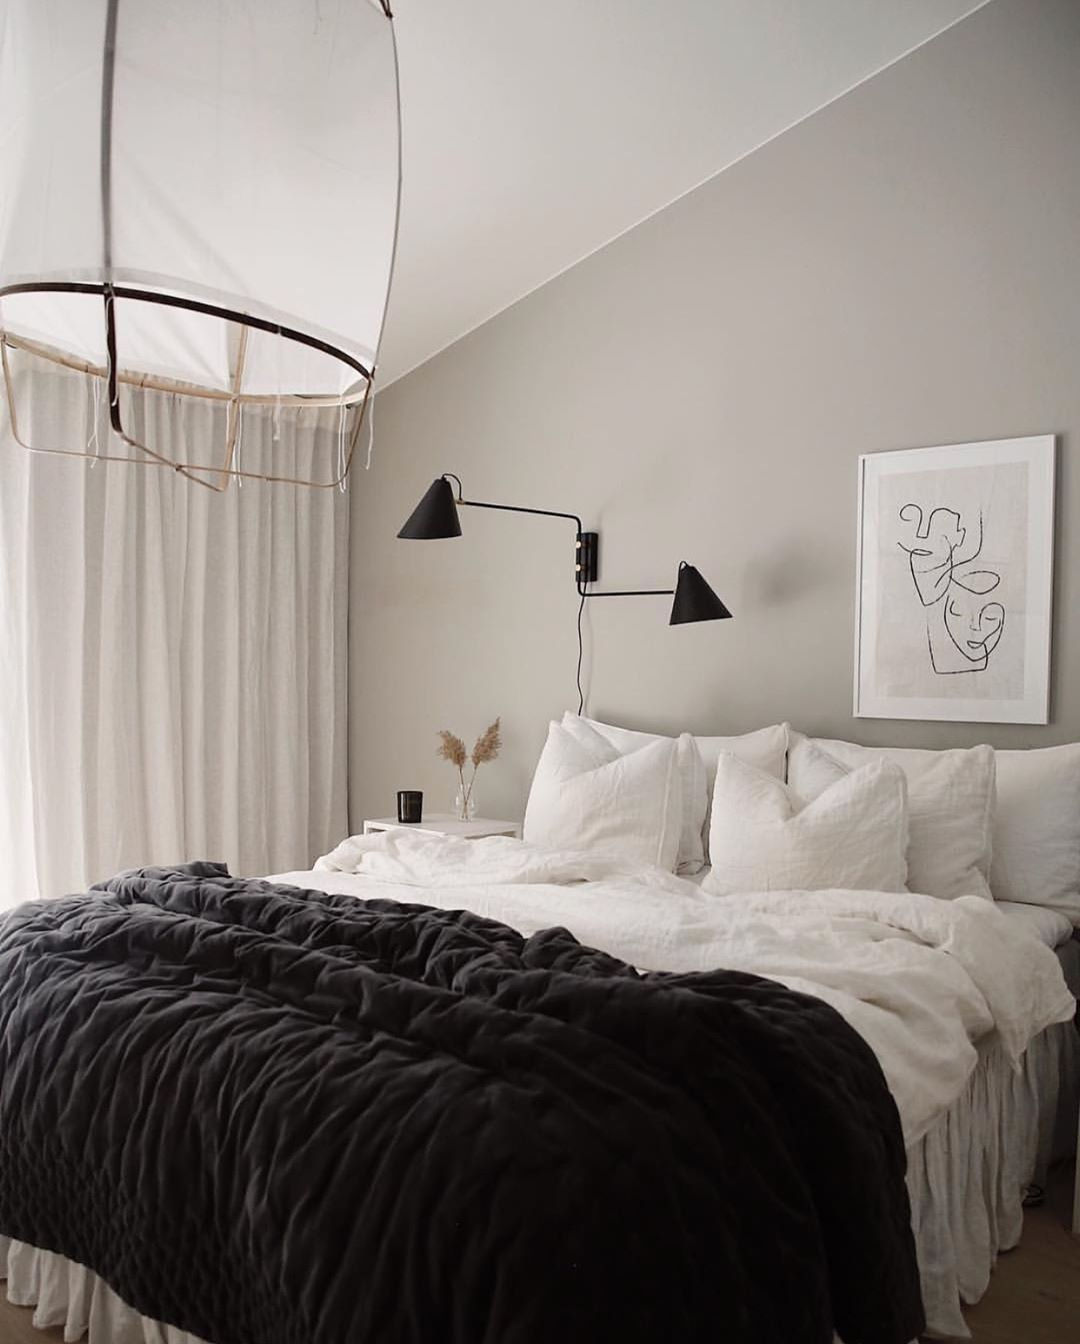 "Photo of Interior & Scandinavian Homes på Instagram: ""Det nydelige soverommet til @emmamelins 👈🏻 God natt alle 🌙. #bedroom #bedroomdecor #bedroominspo #nordichome #nordicinspiration """